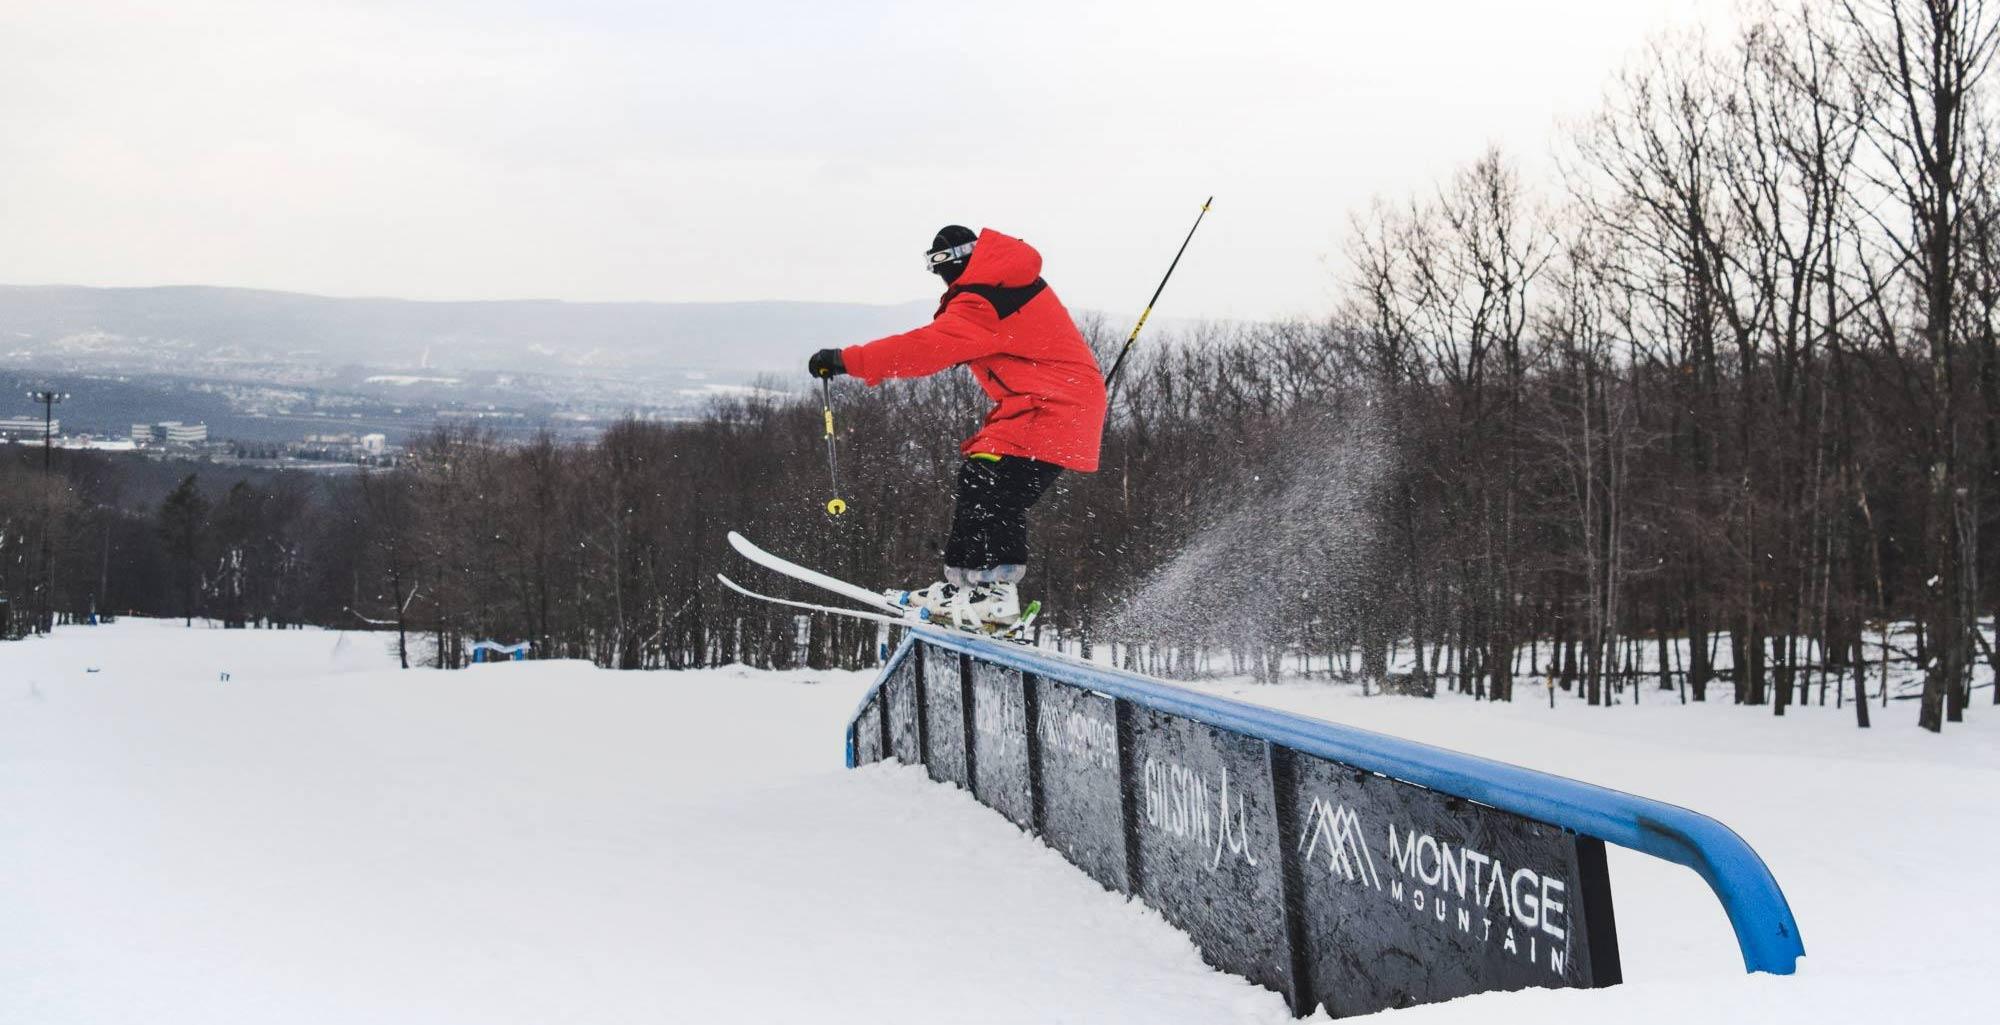 Terrain Park Pa Ski Resort Skiing Snowboarding